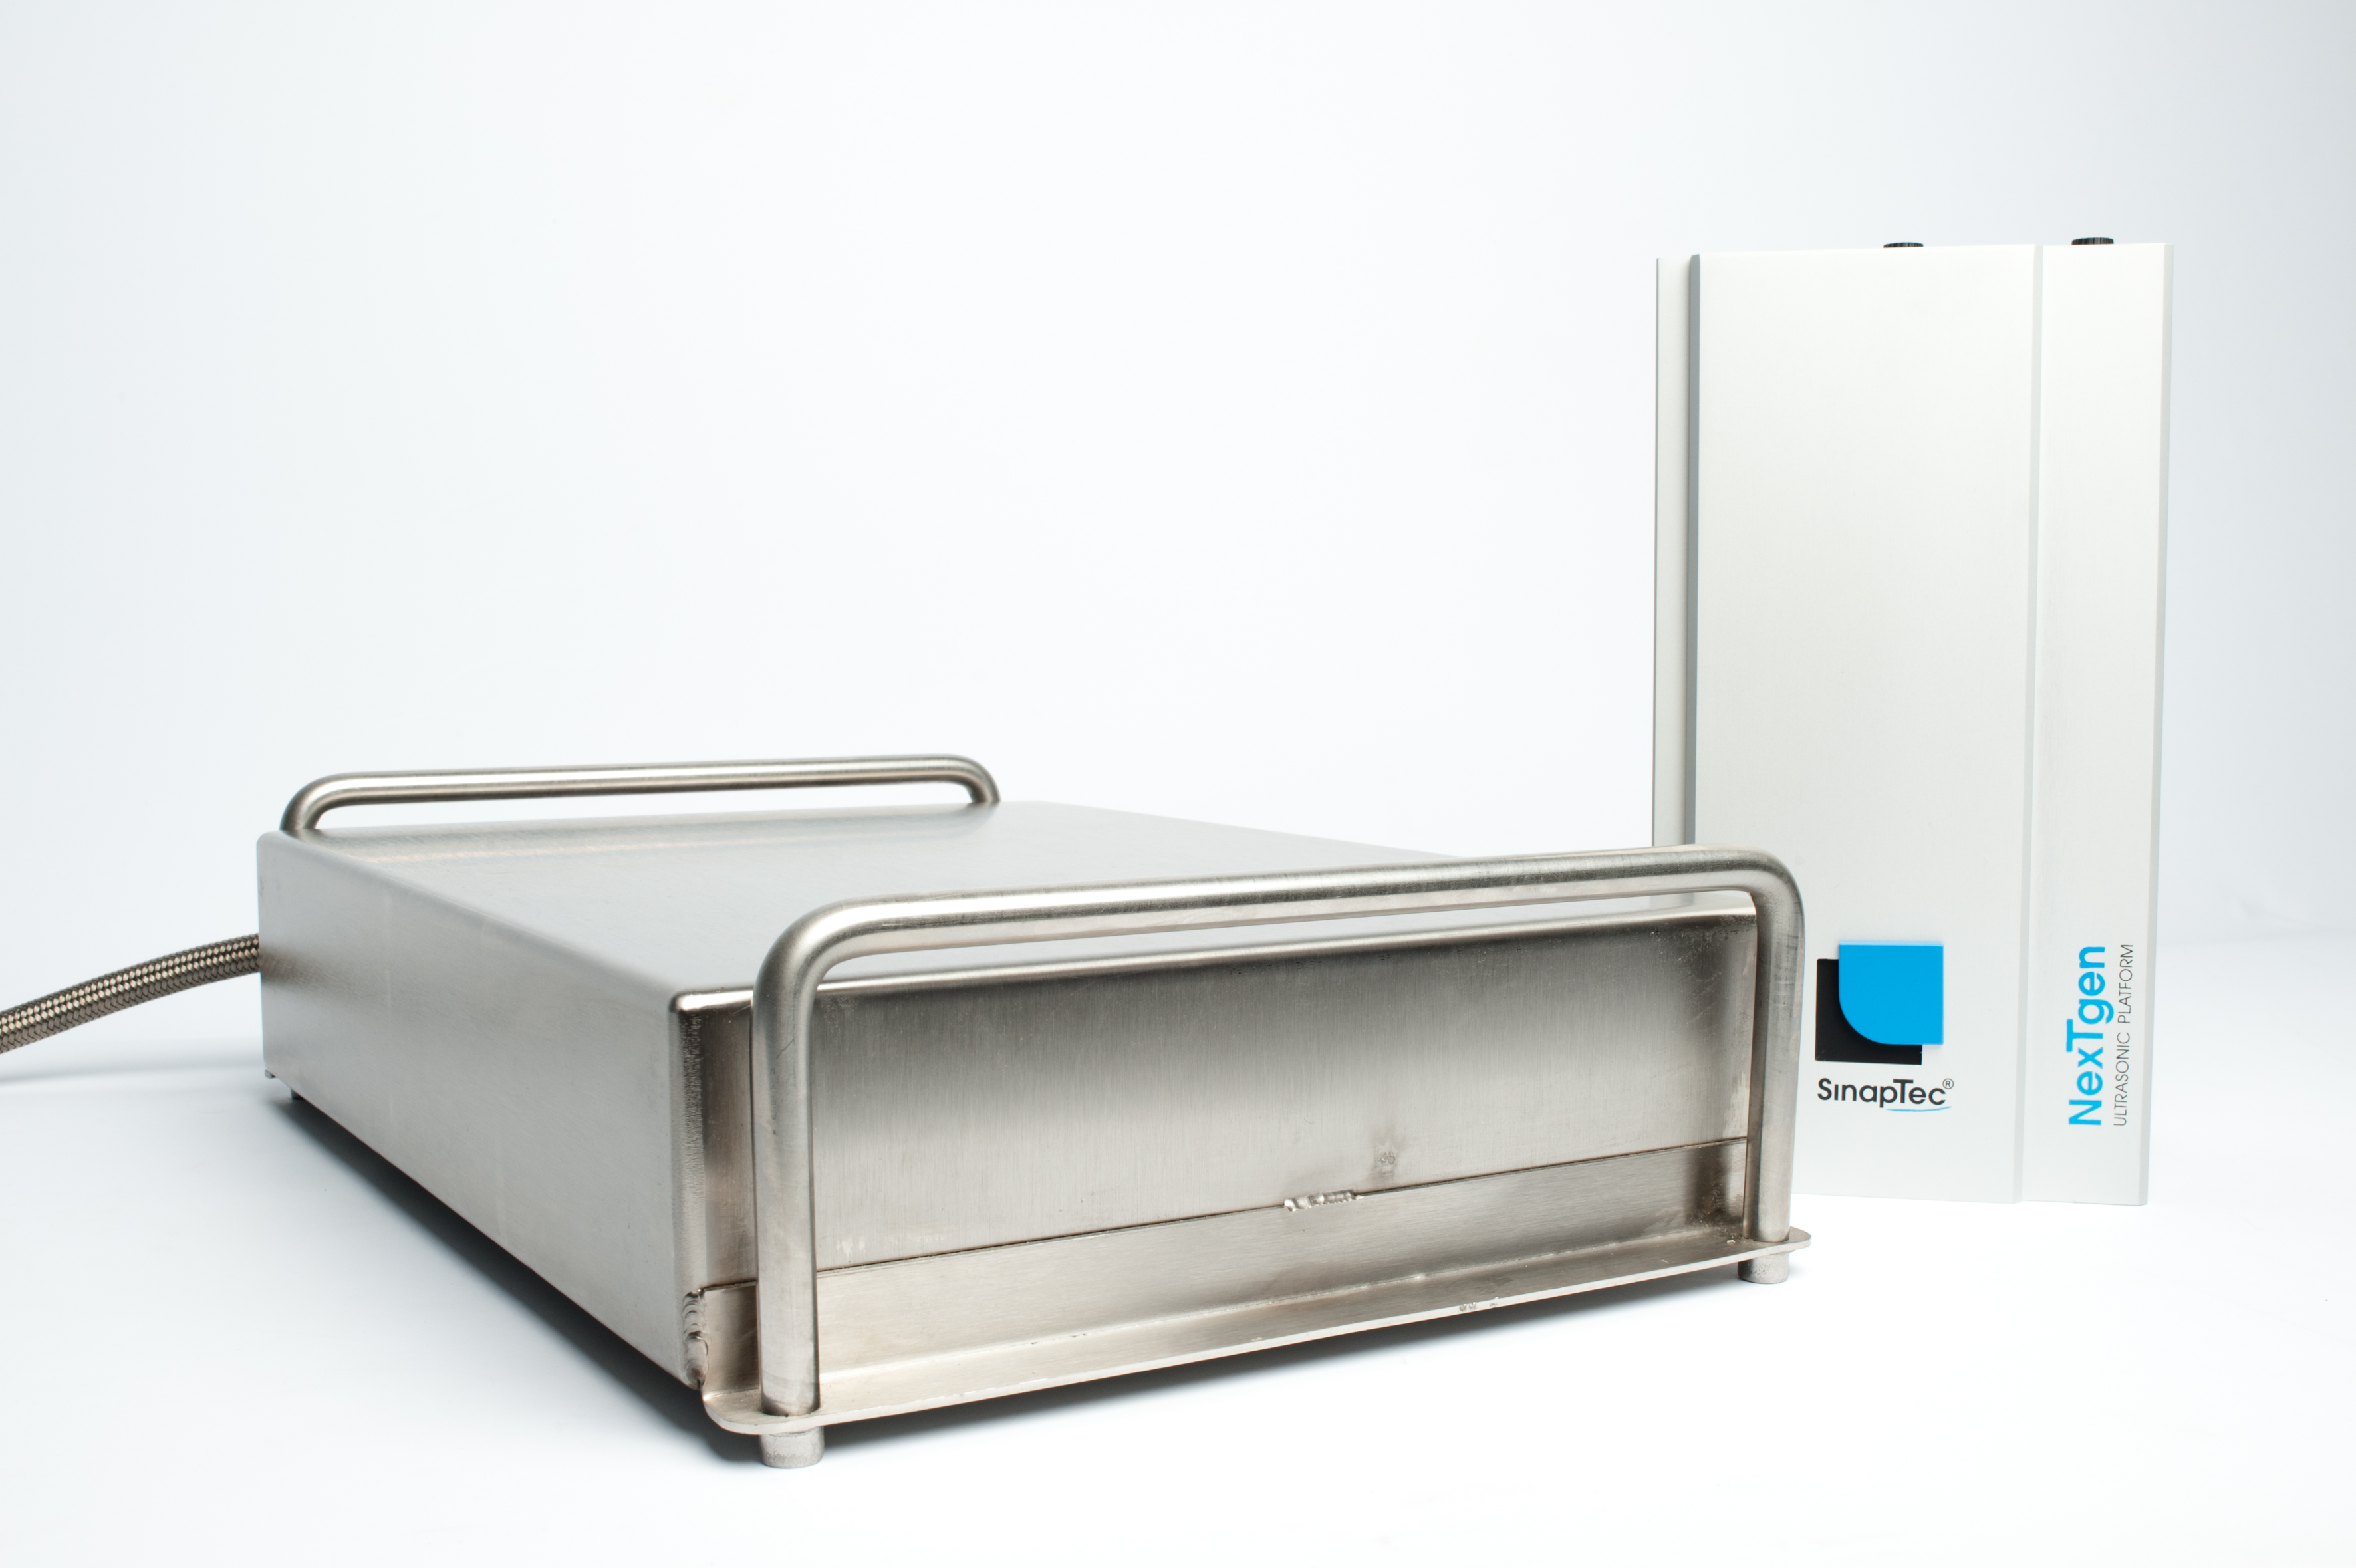 Pavé immergeable pour nettoyage ultrasons | SinapTec